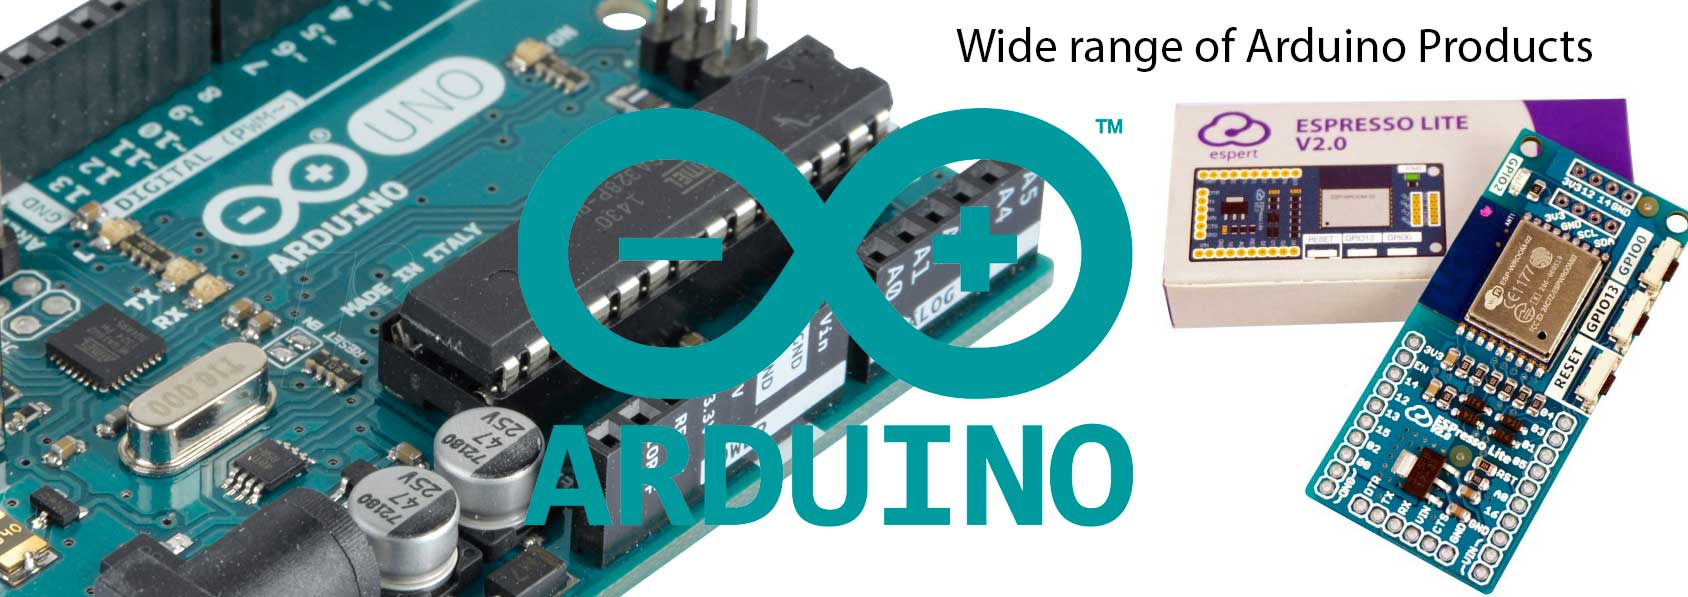 Arduino Uno Arduino Mega Boards